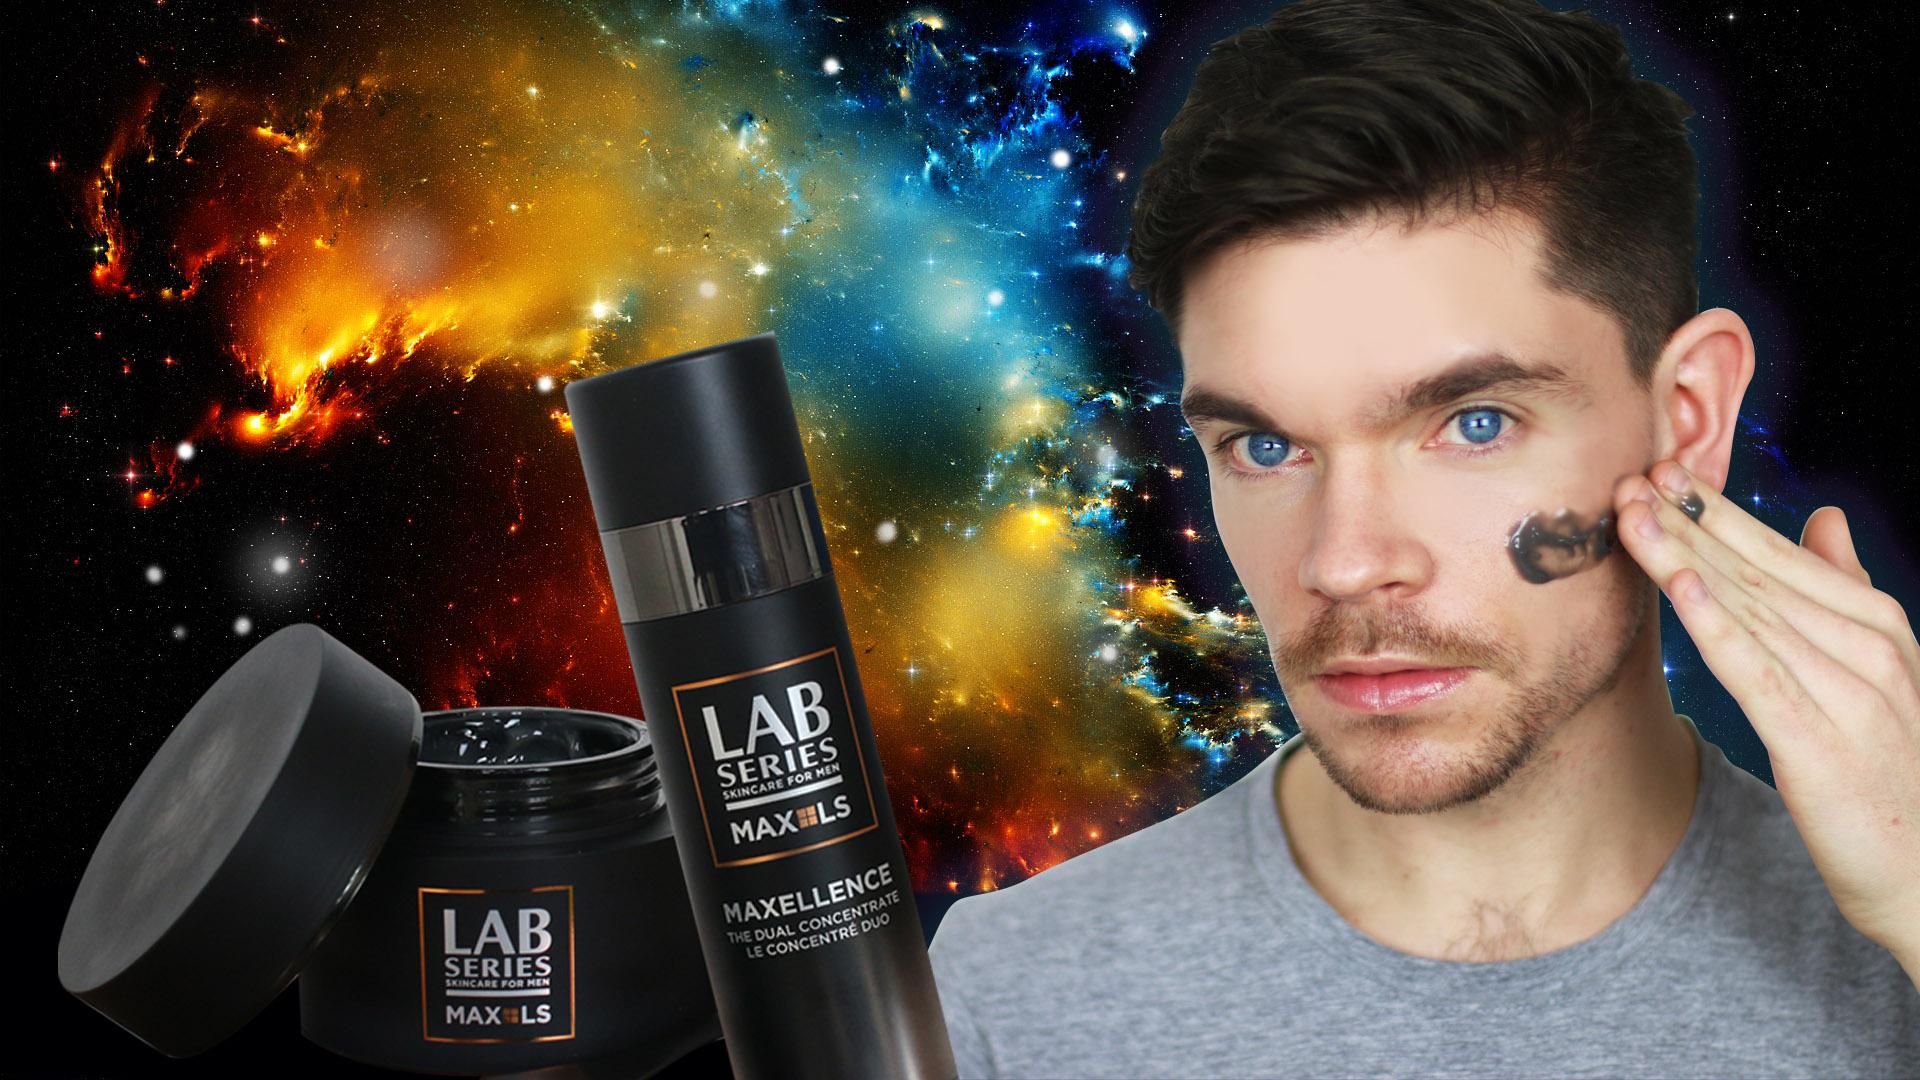 lab-series-maxellence-meteorite-moisturiser-man-for-himself